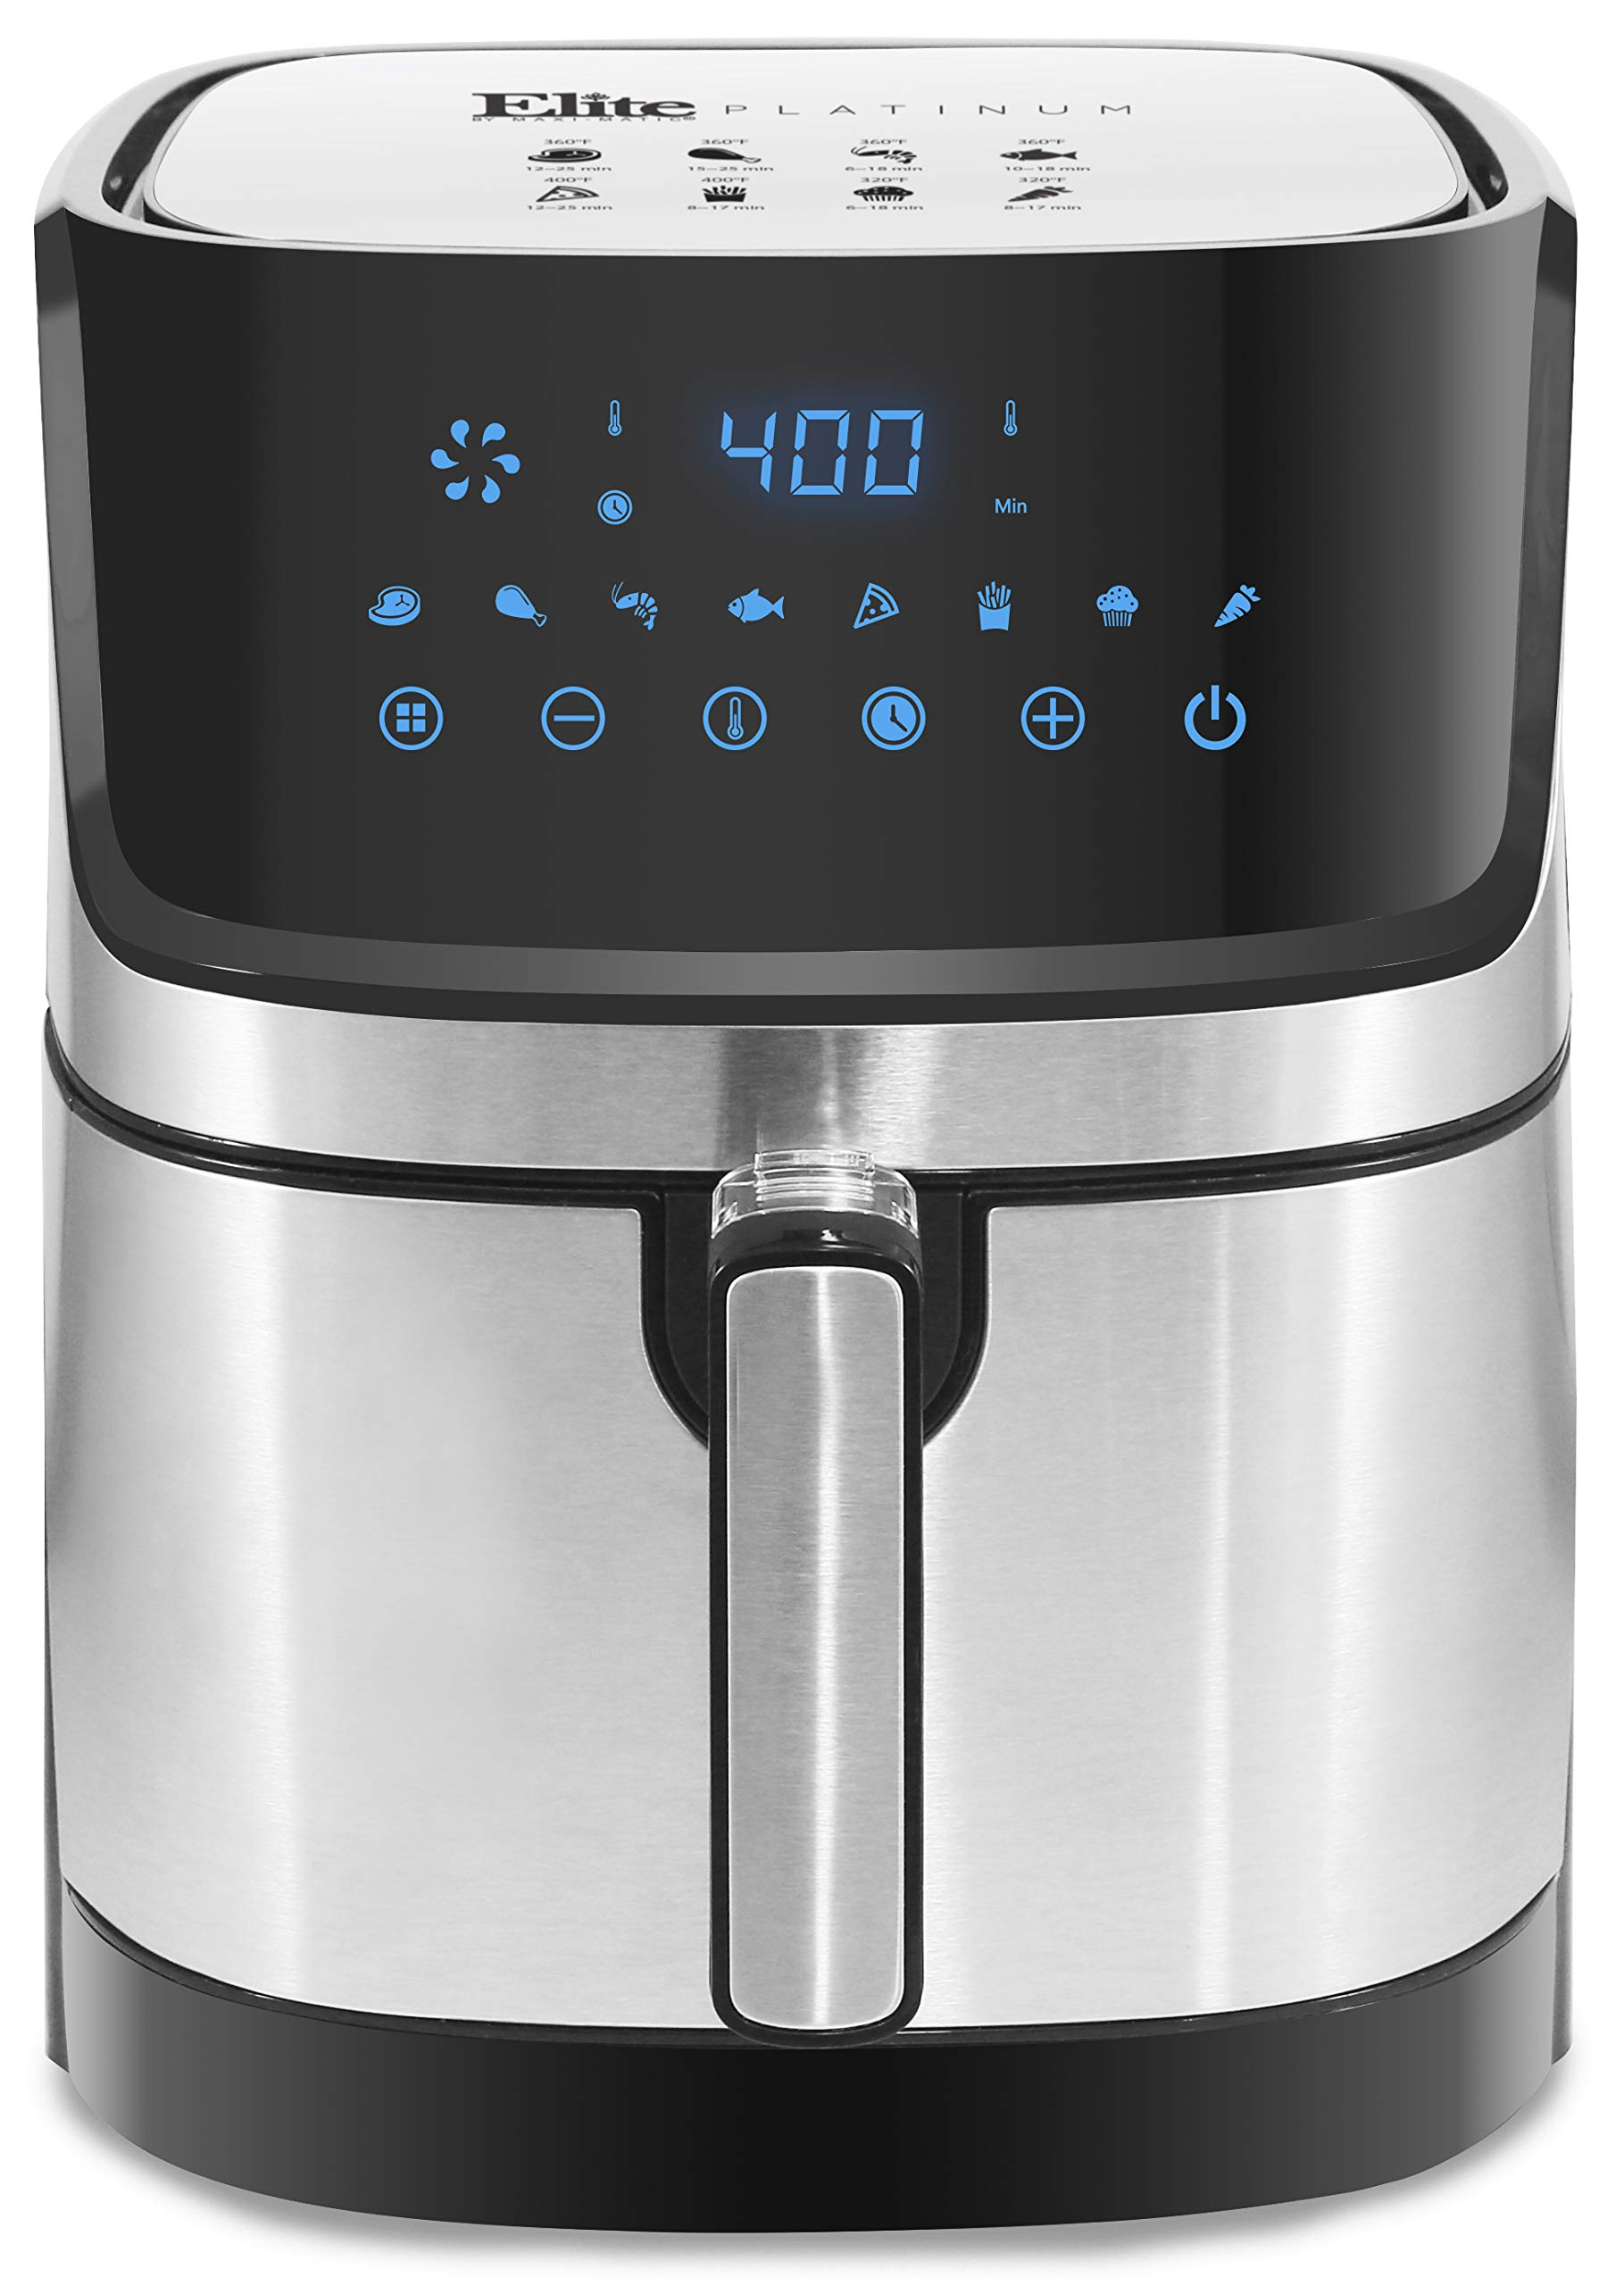 Maxi-Matic EAF-501SS Electric Digital Hot Air Fryer Oil-Less Healthy Cooker, 8 Menu Functions, Temp/Timer Settings, PFOA/PTFE Free, 1700-Watts, Stainless Steel 5.3 Quart